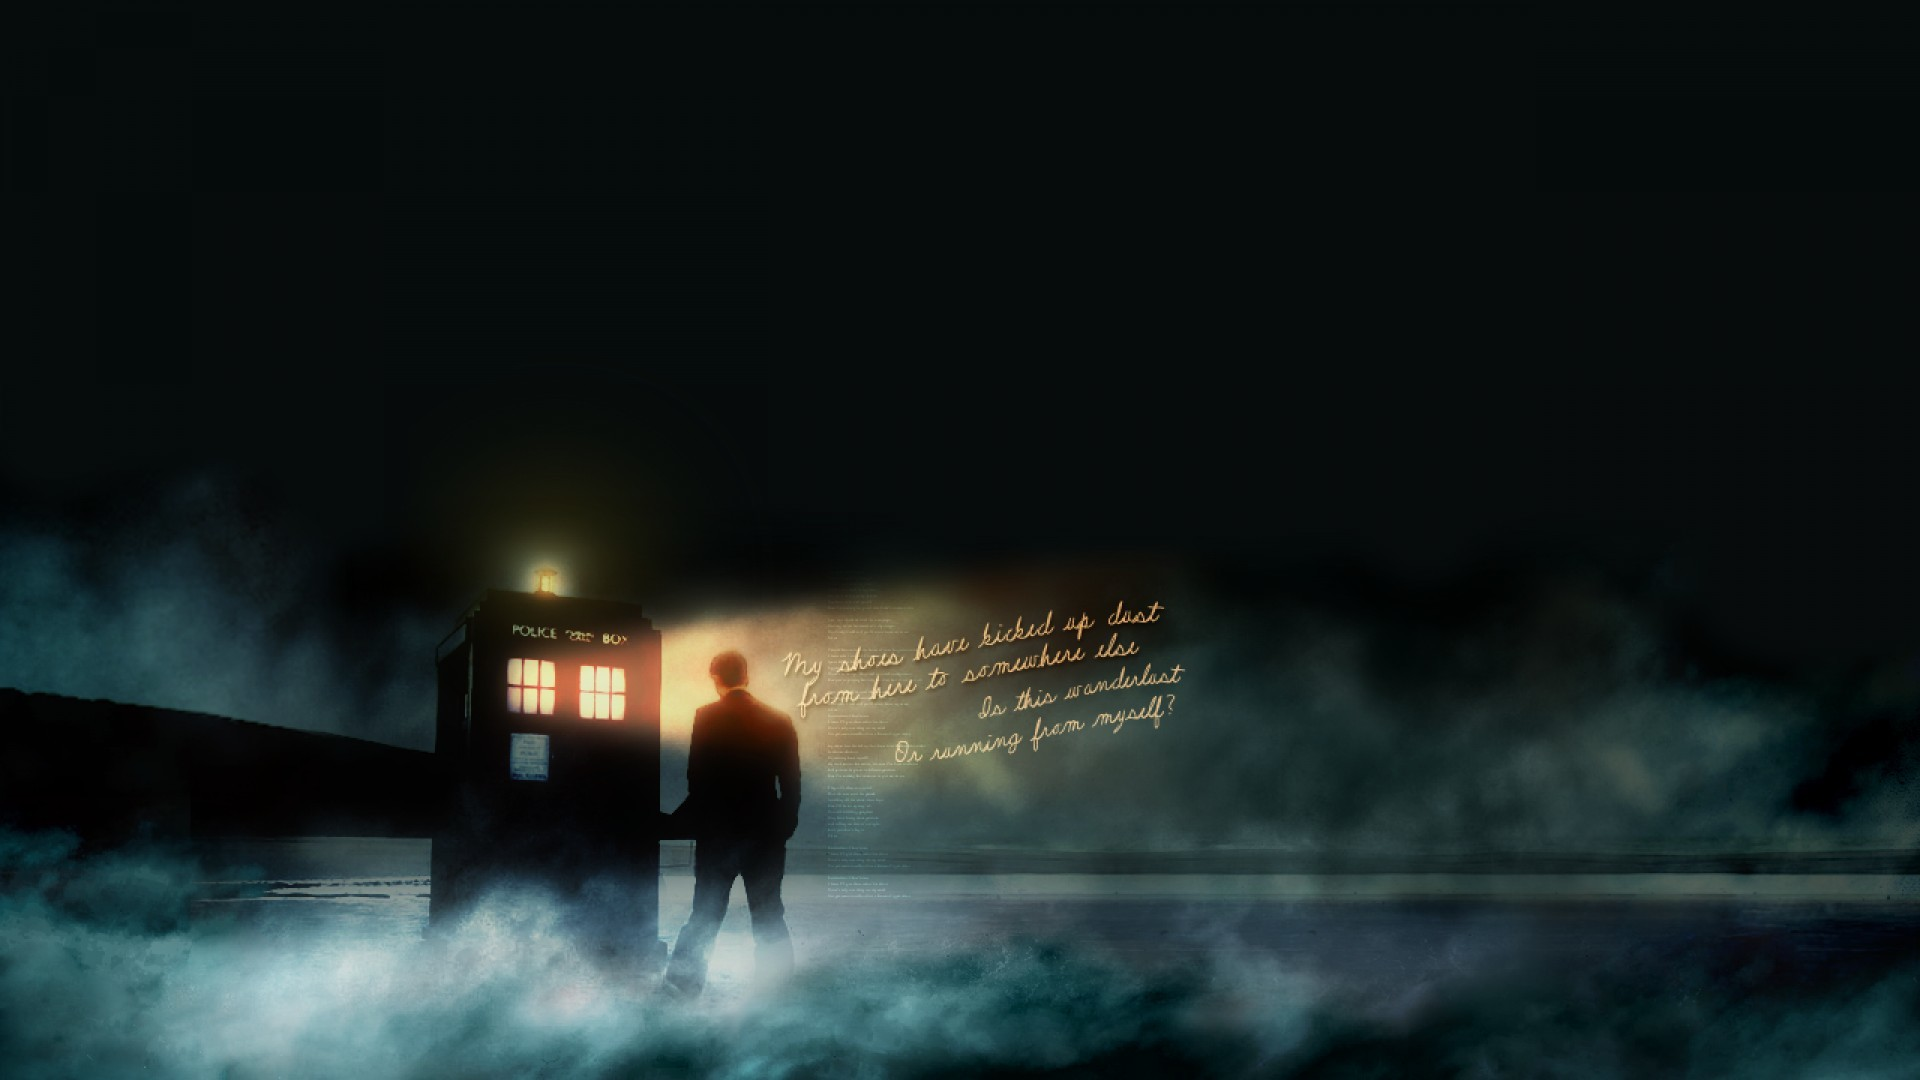 FunMozar – Doctor Who Wallpapers